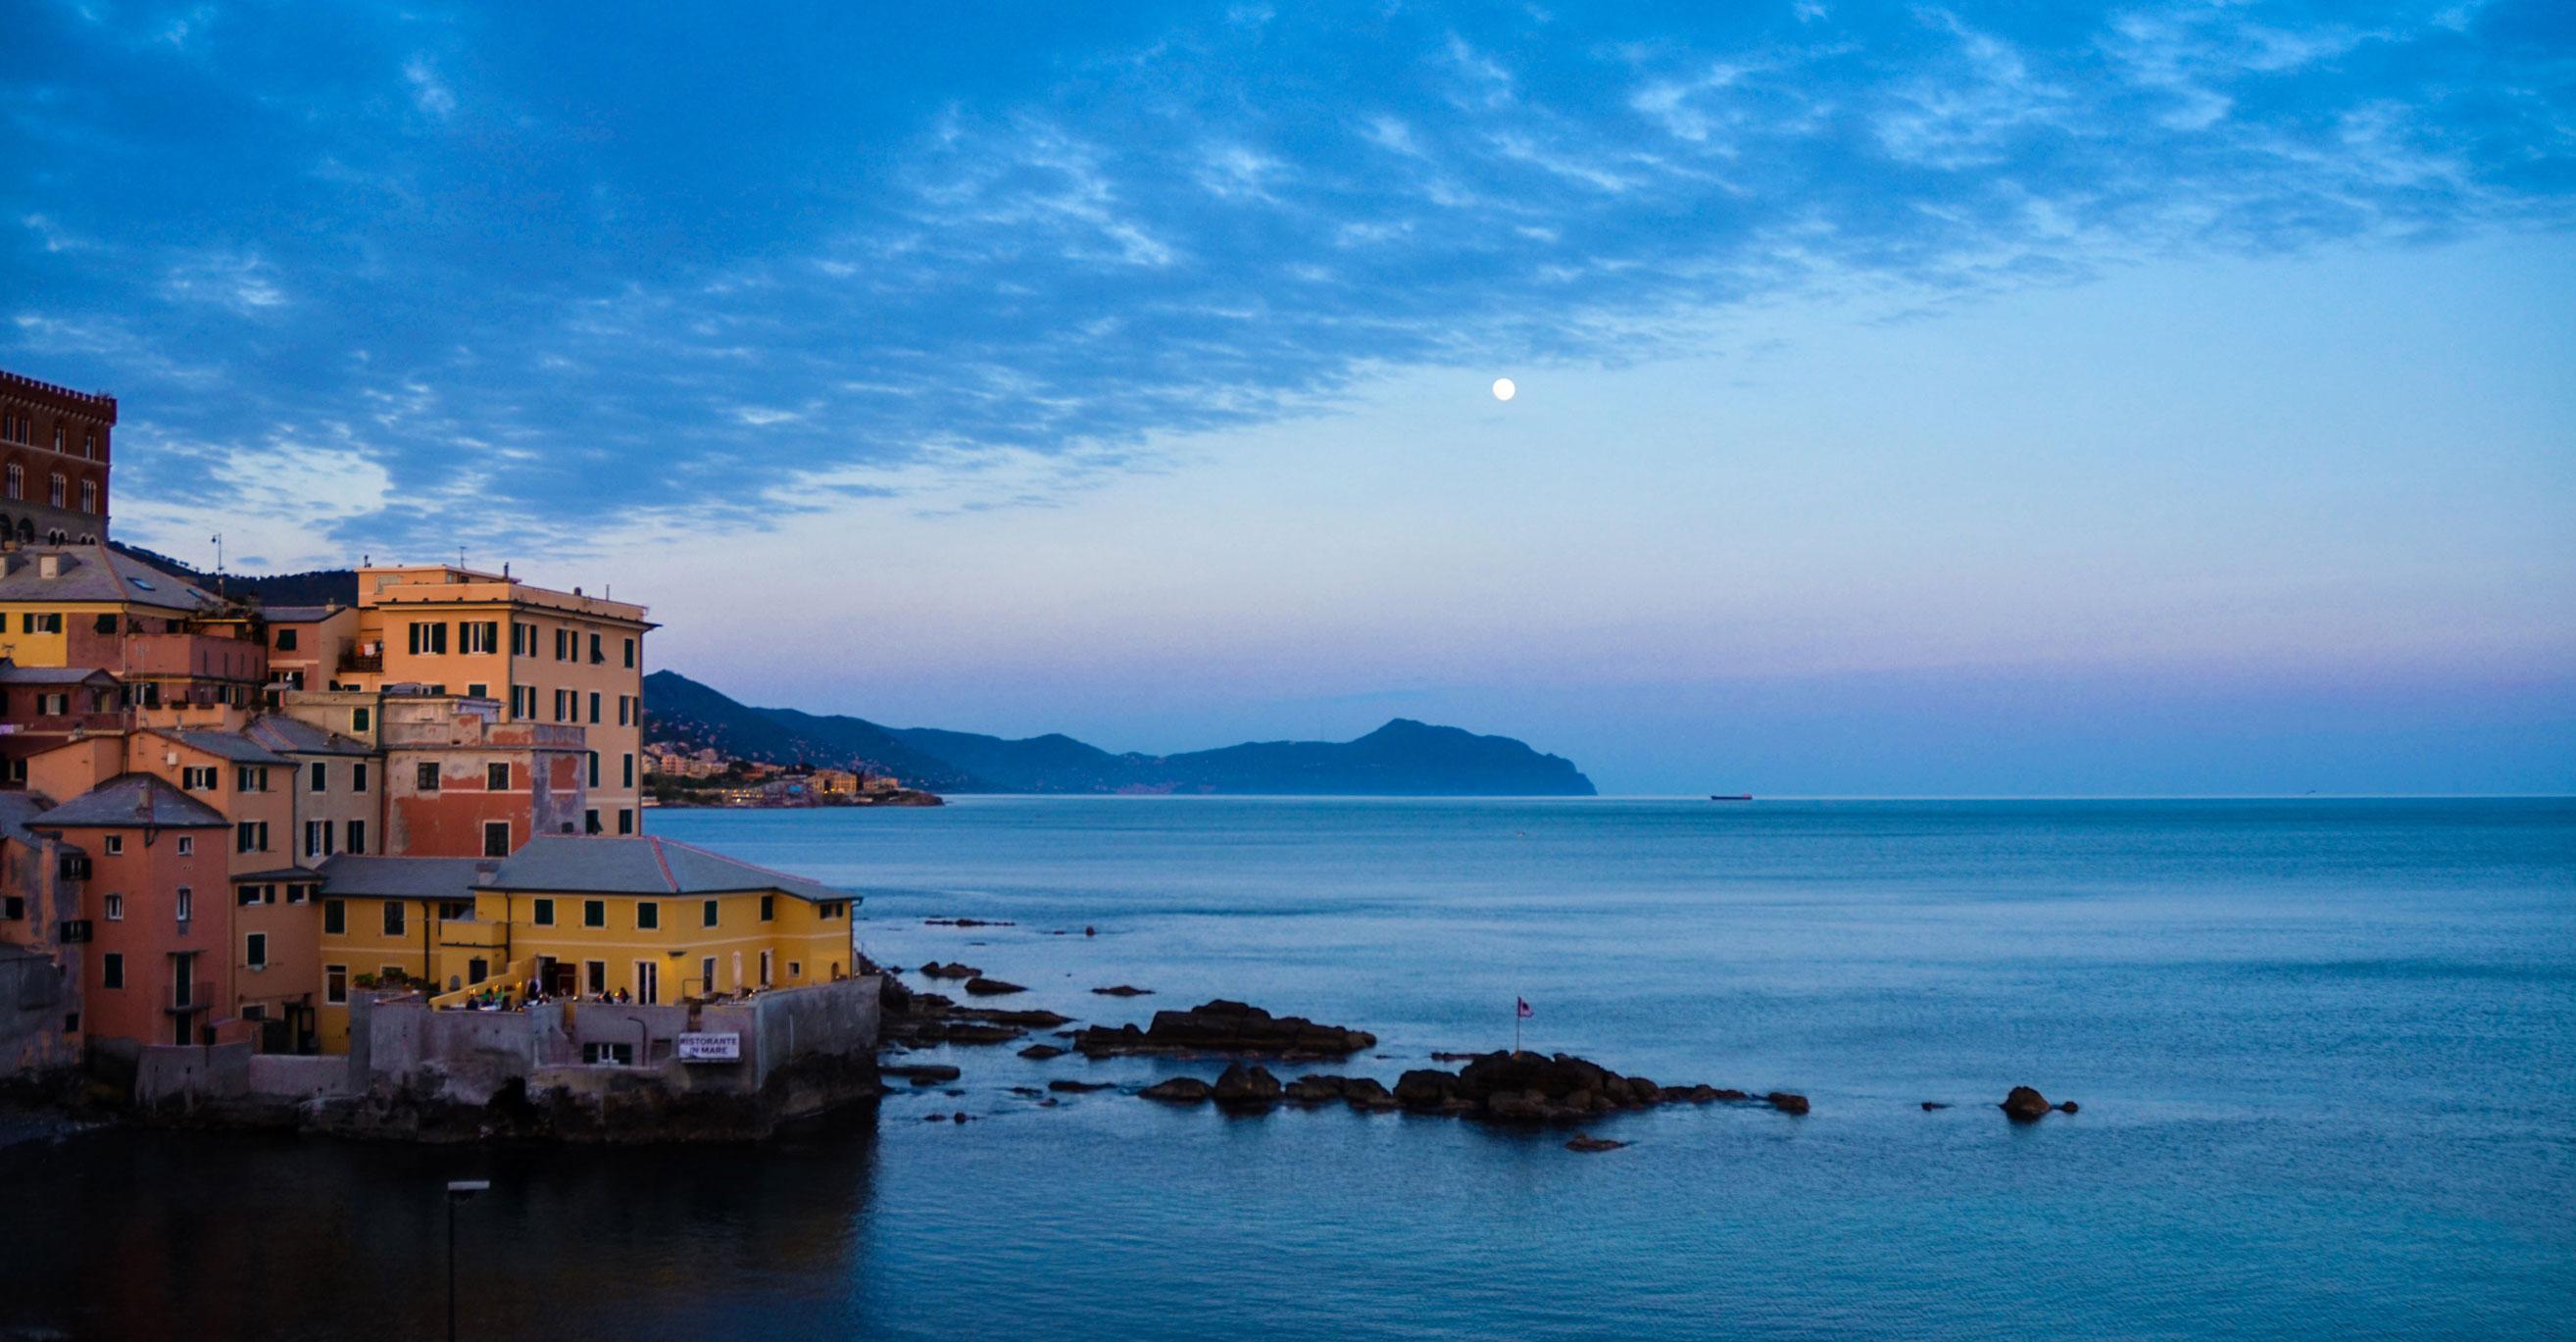 Paesaggi-Italia - Alba a Boccadasse Genova Liguria - Alba_a_Boccadasse_Genova_Liguria -